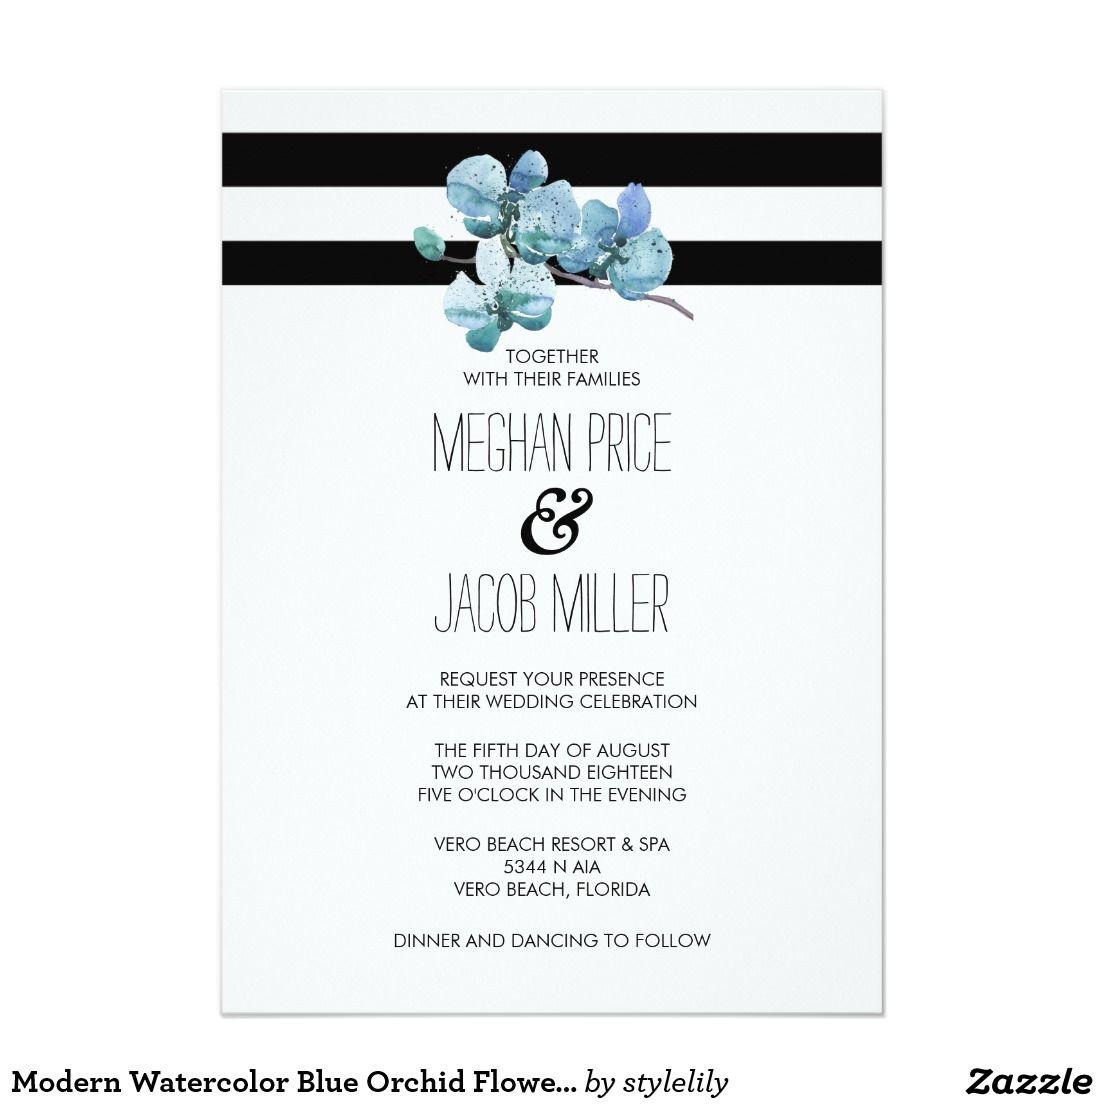 Modern Watercolor Blue Orchid Flower Wedding Invitation   Pinterest ...